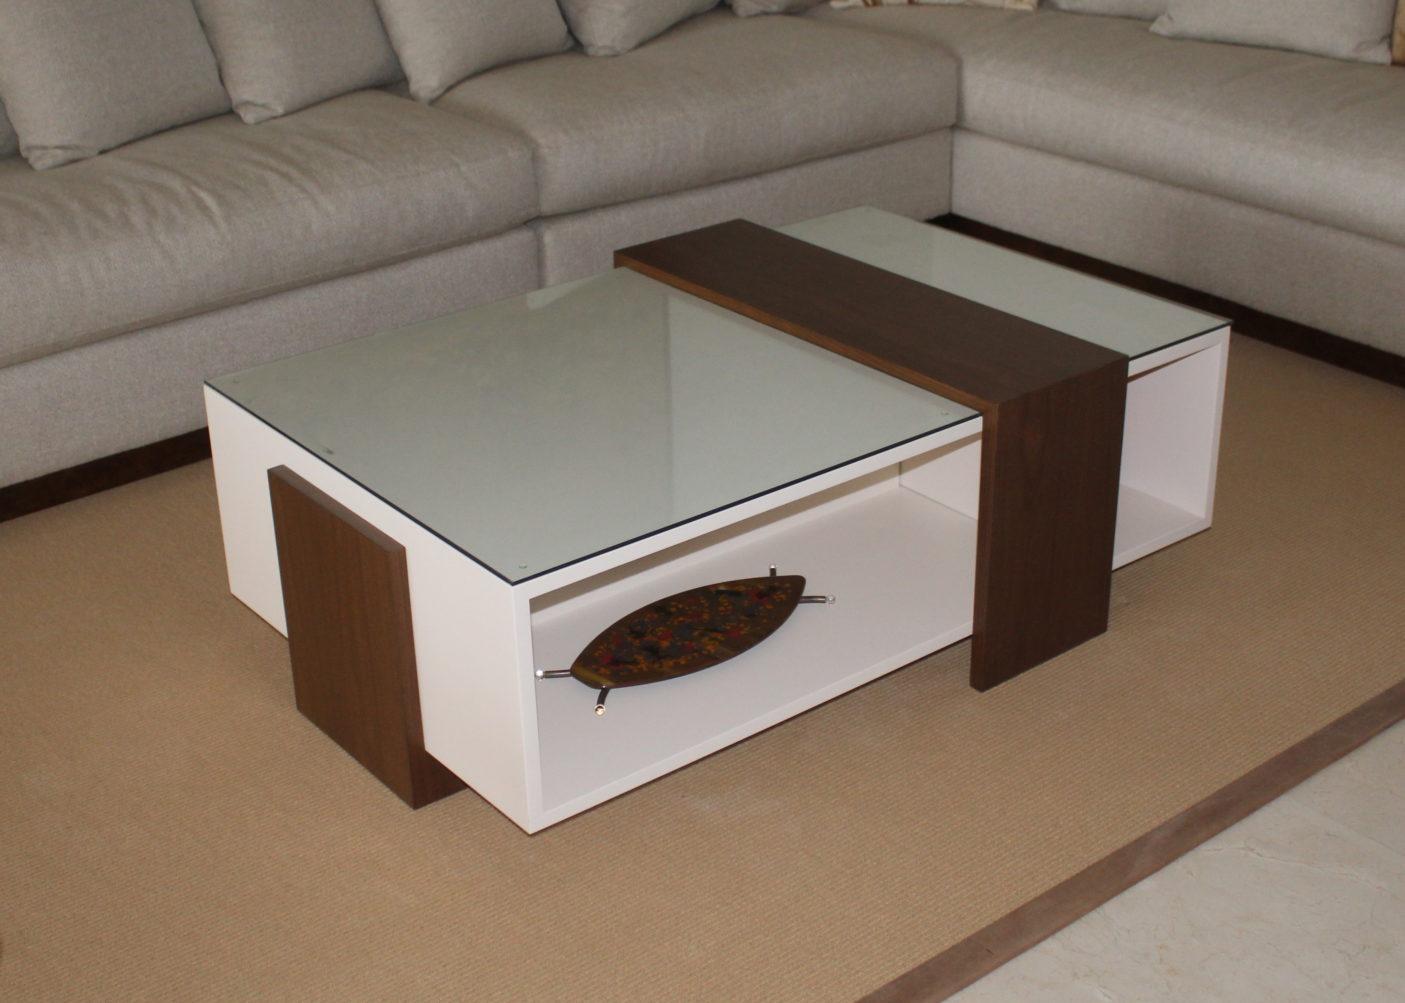 Tables-46.jpg